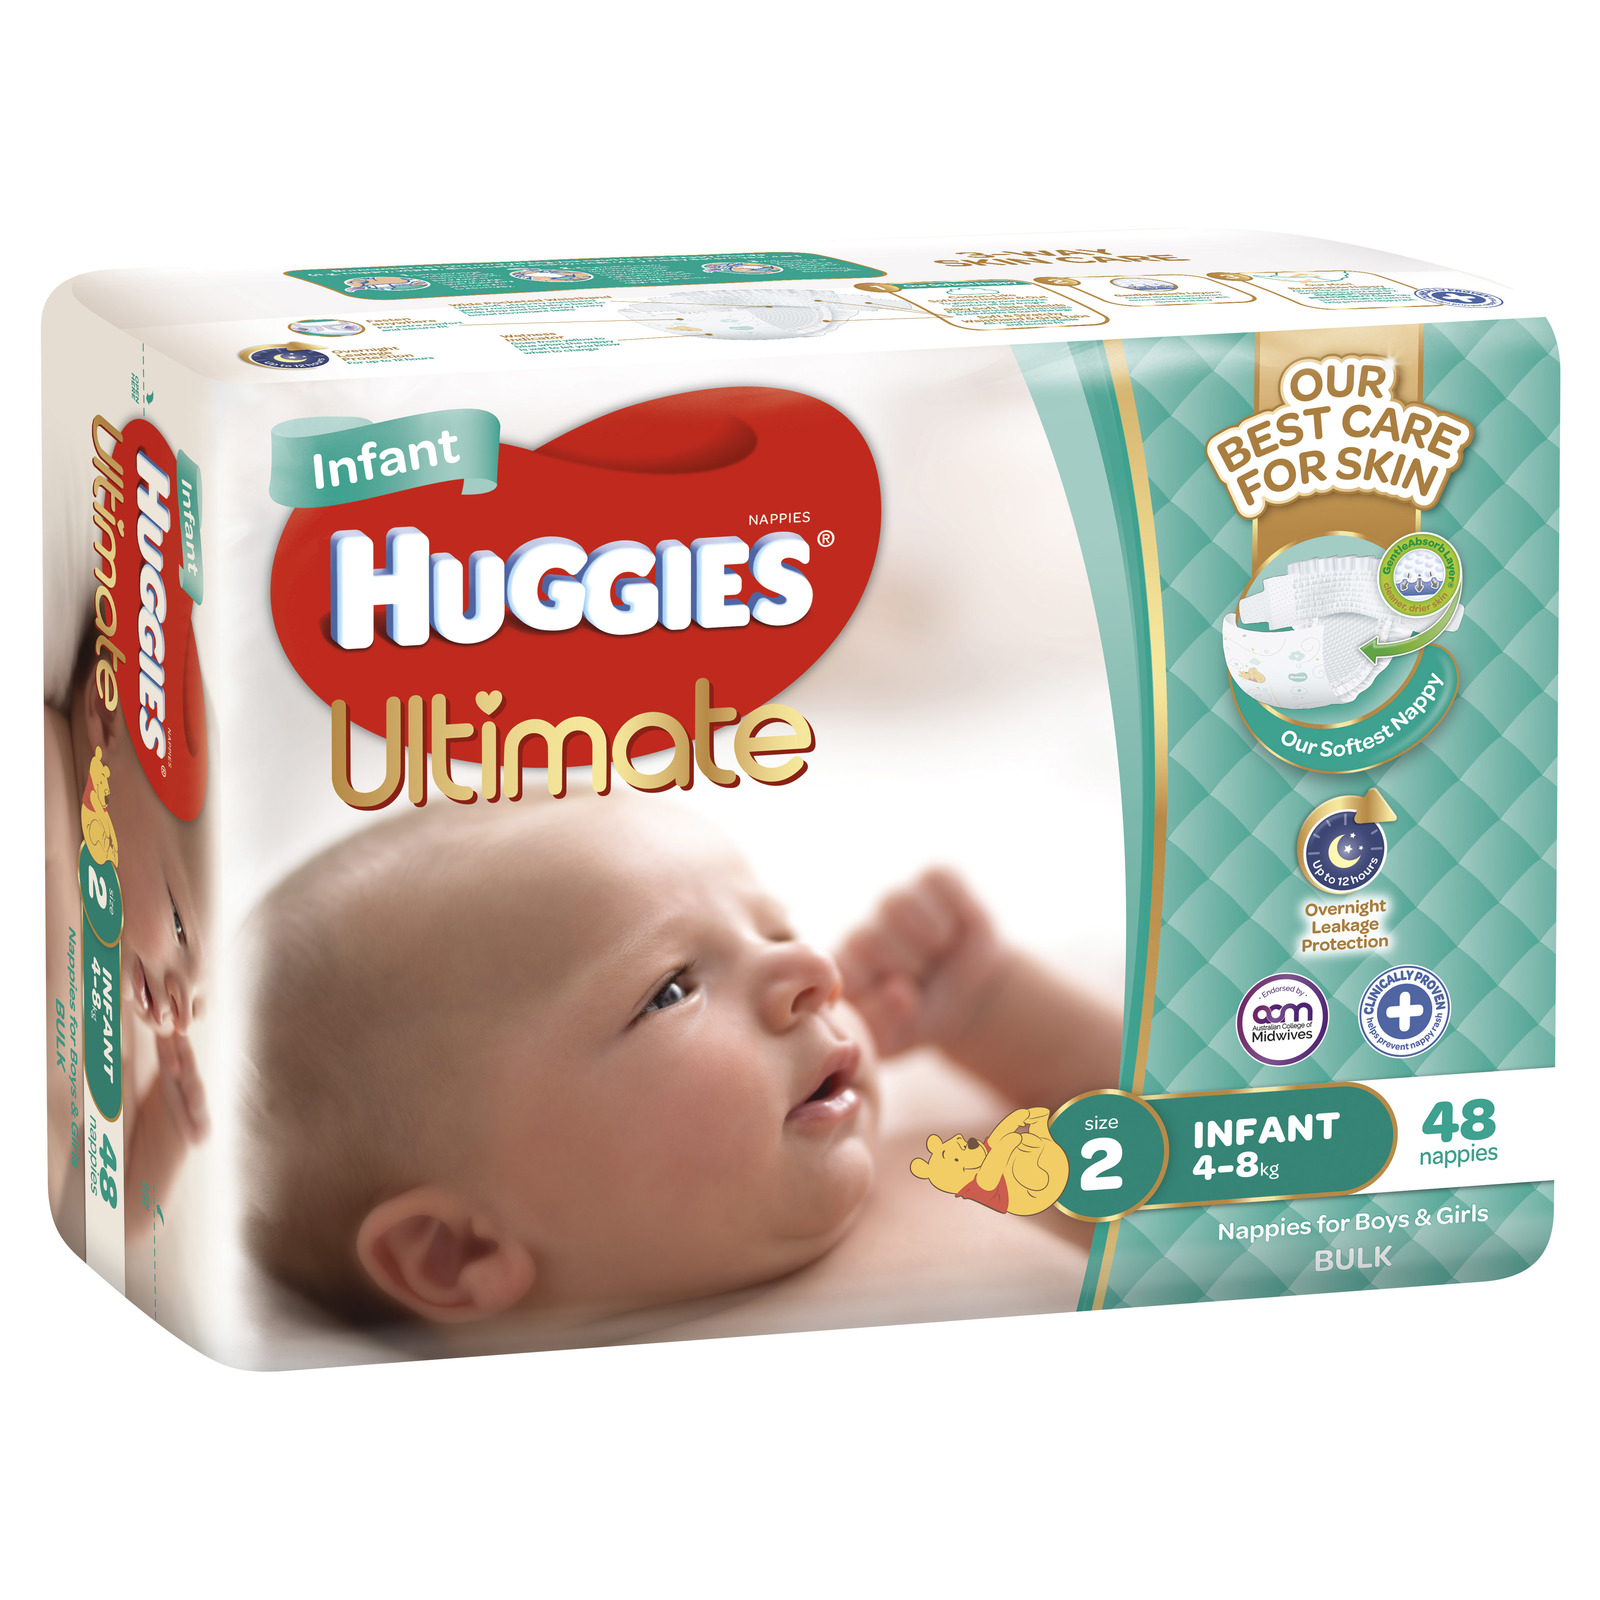 Huggies Ultimate Nappies Bulk - Infant 4-8kg (48) image